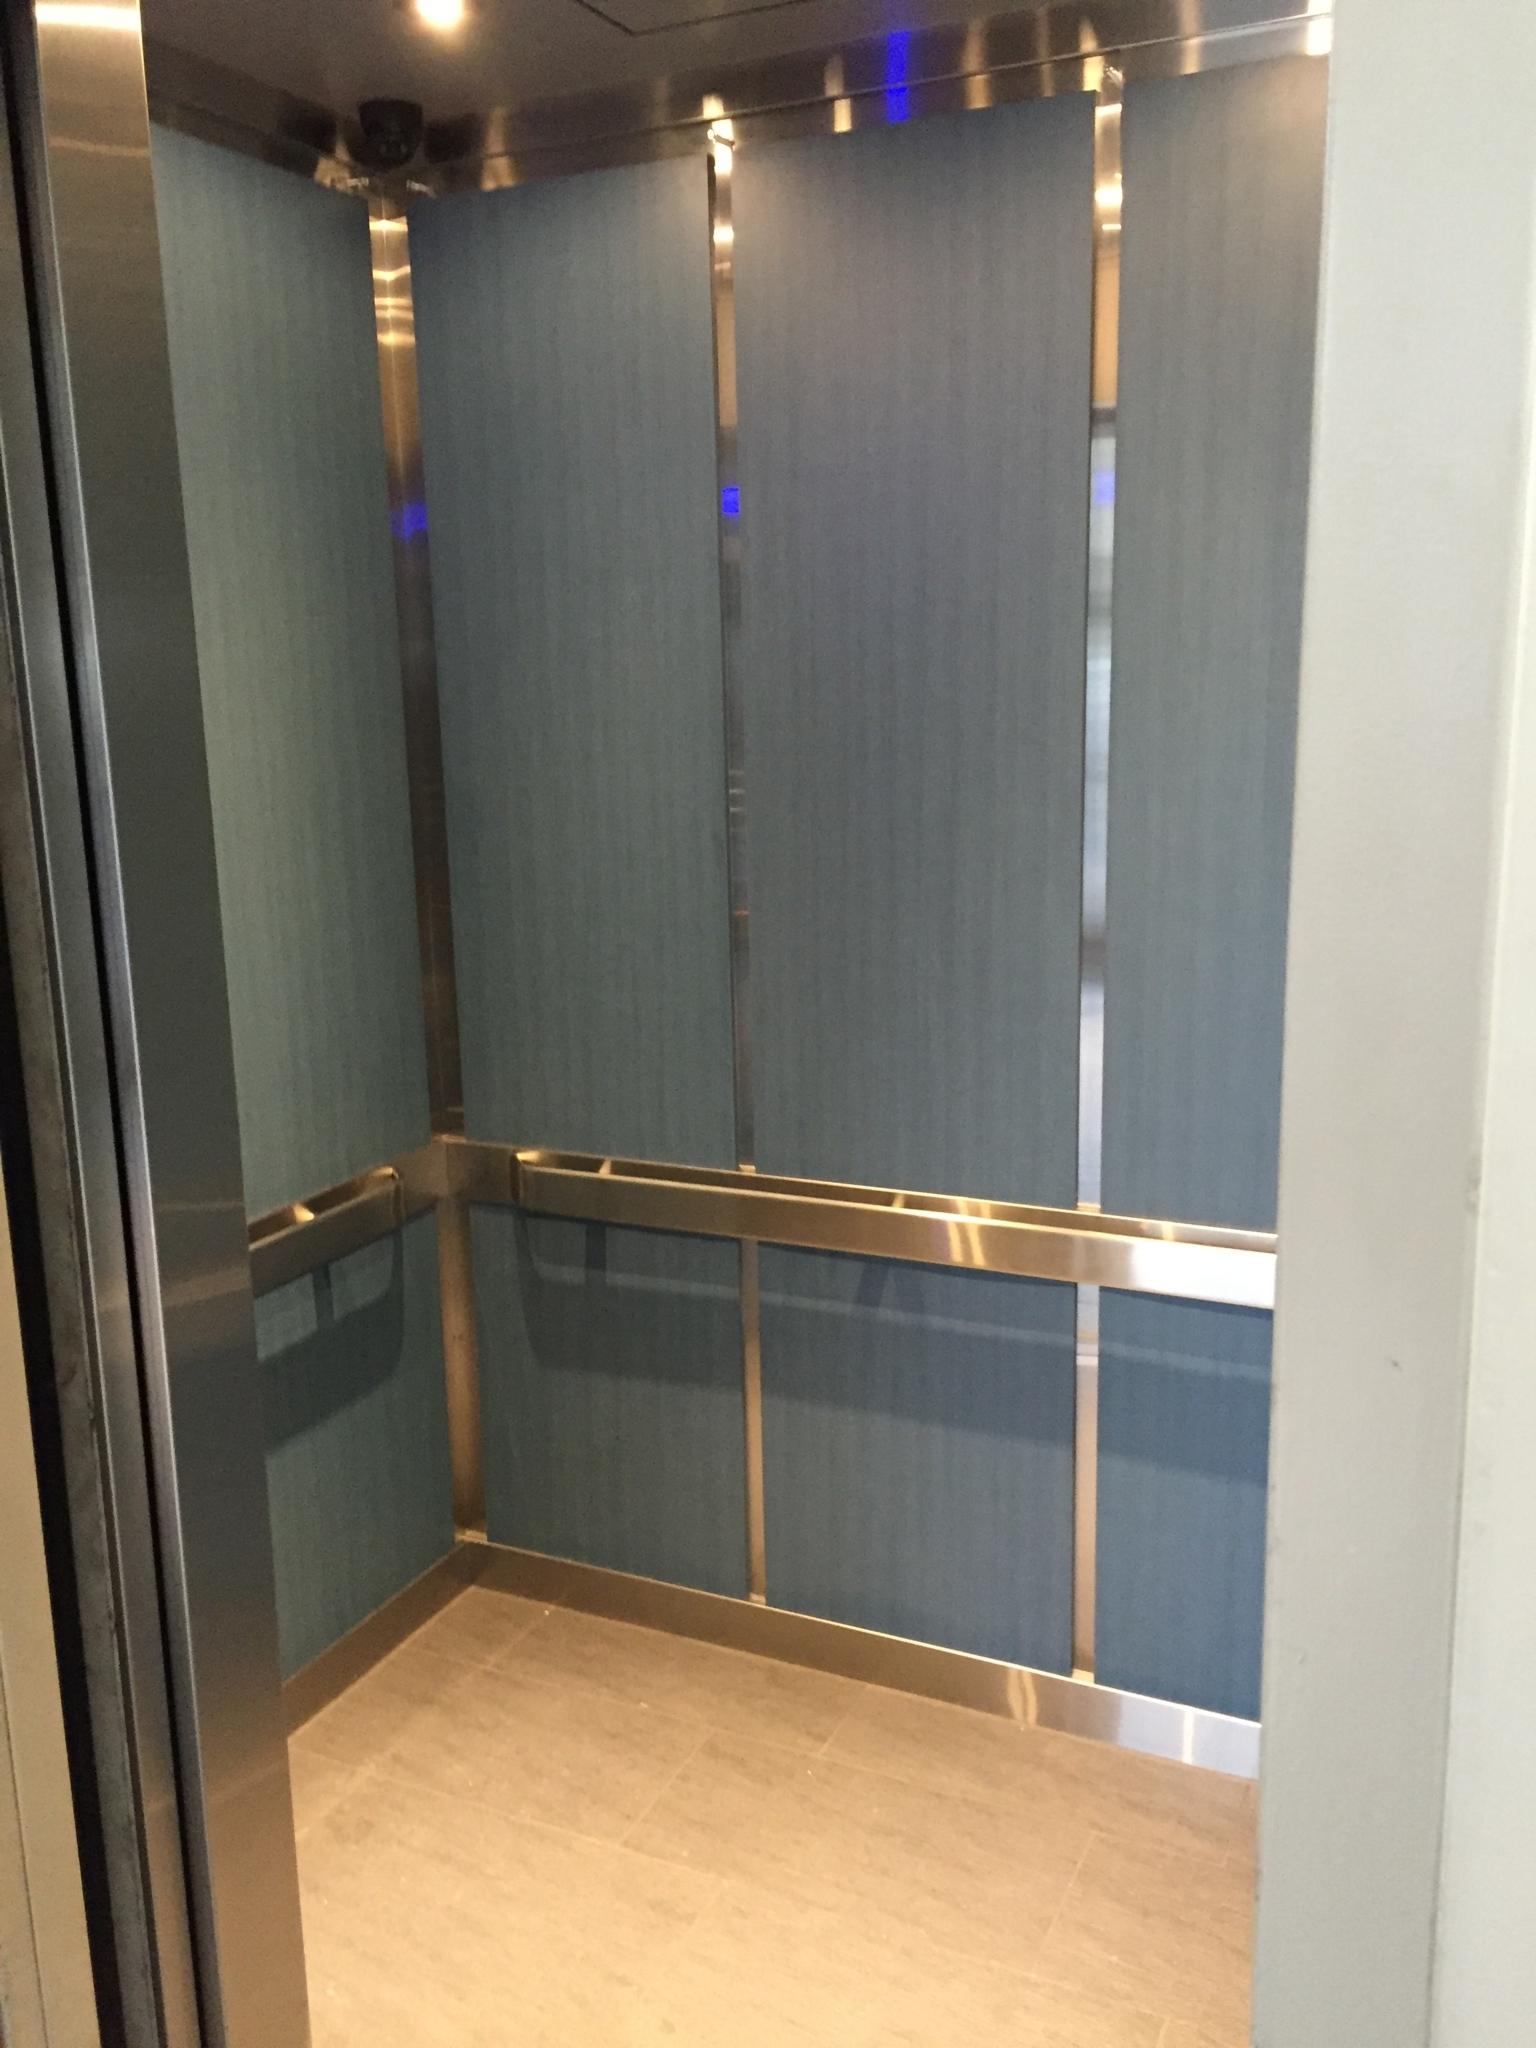 Eltec Elevator Ltd in North Vancouver